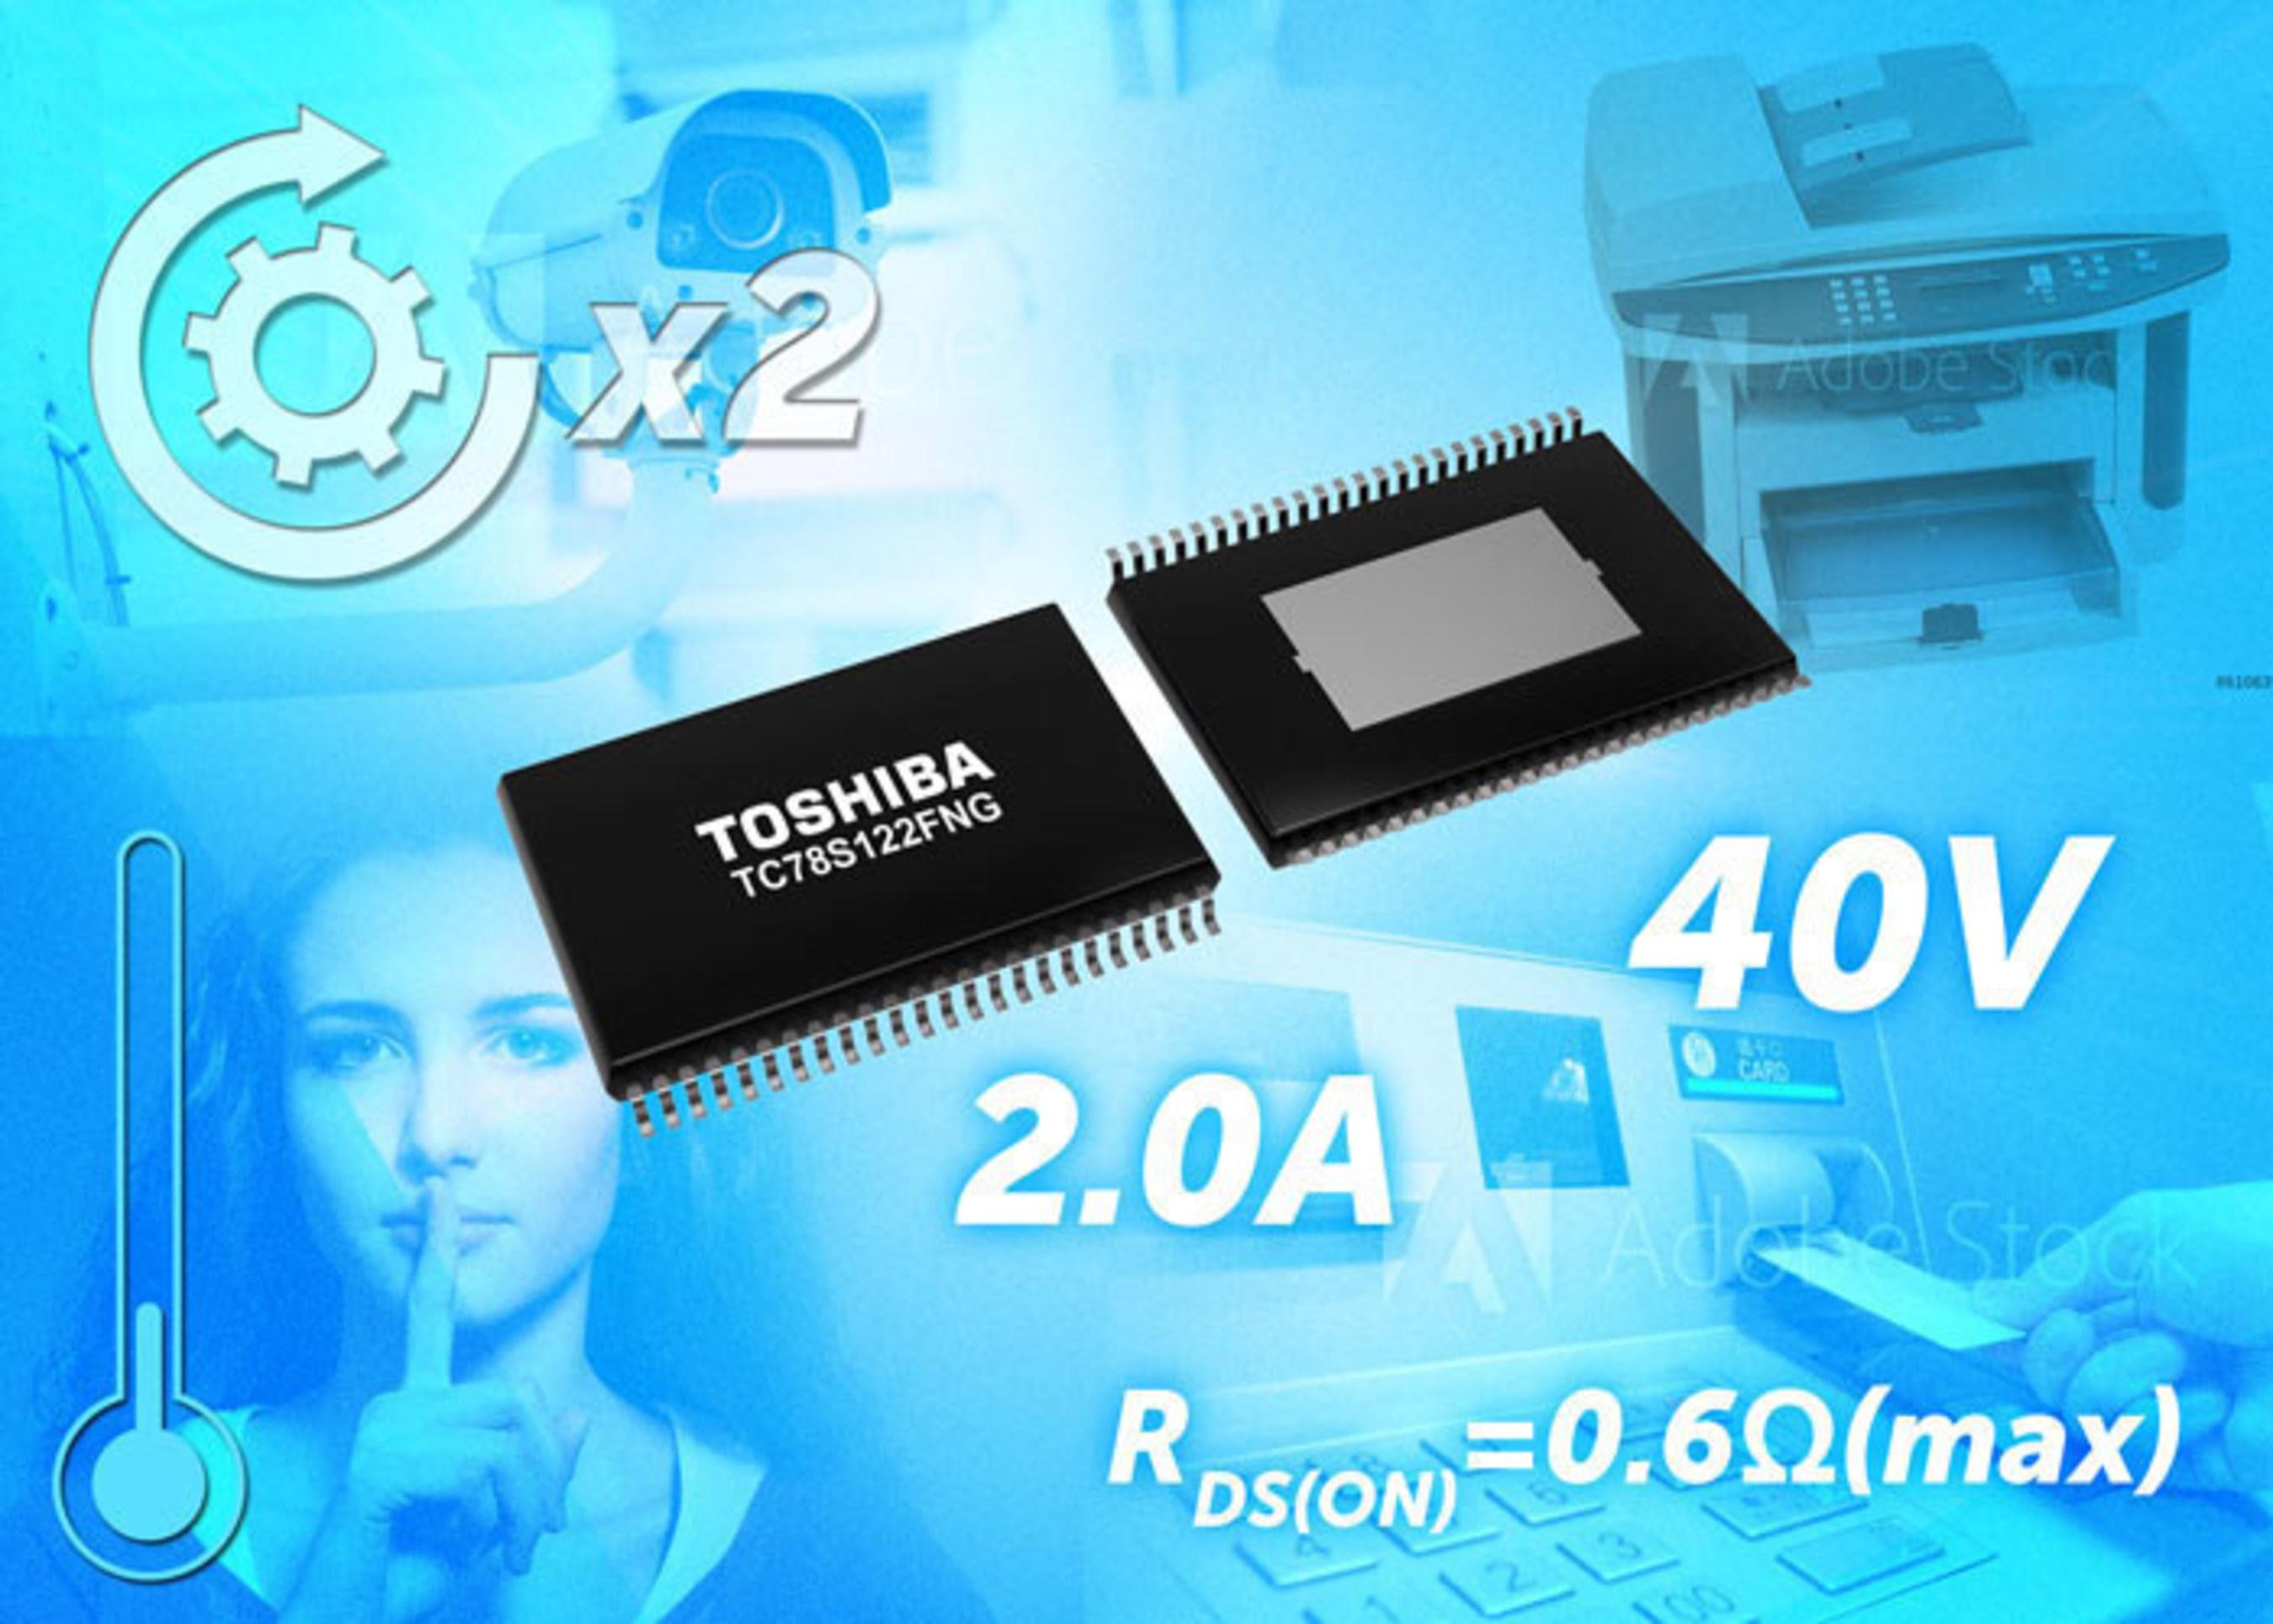 Toshiba's new TC78S122FNG multi-configurable bipolar stepping motor driver operates at 40V/2.0A maximum.